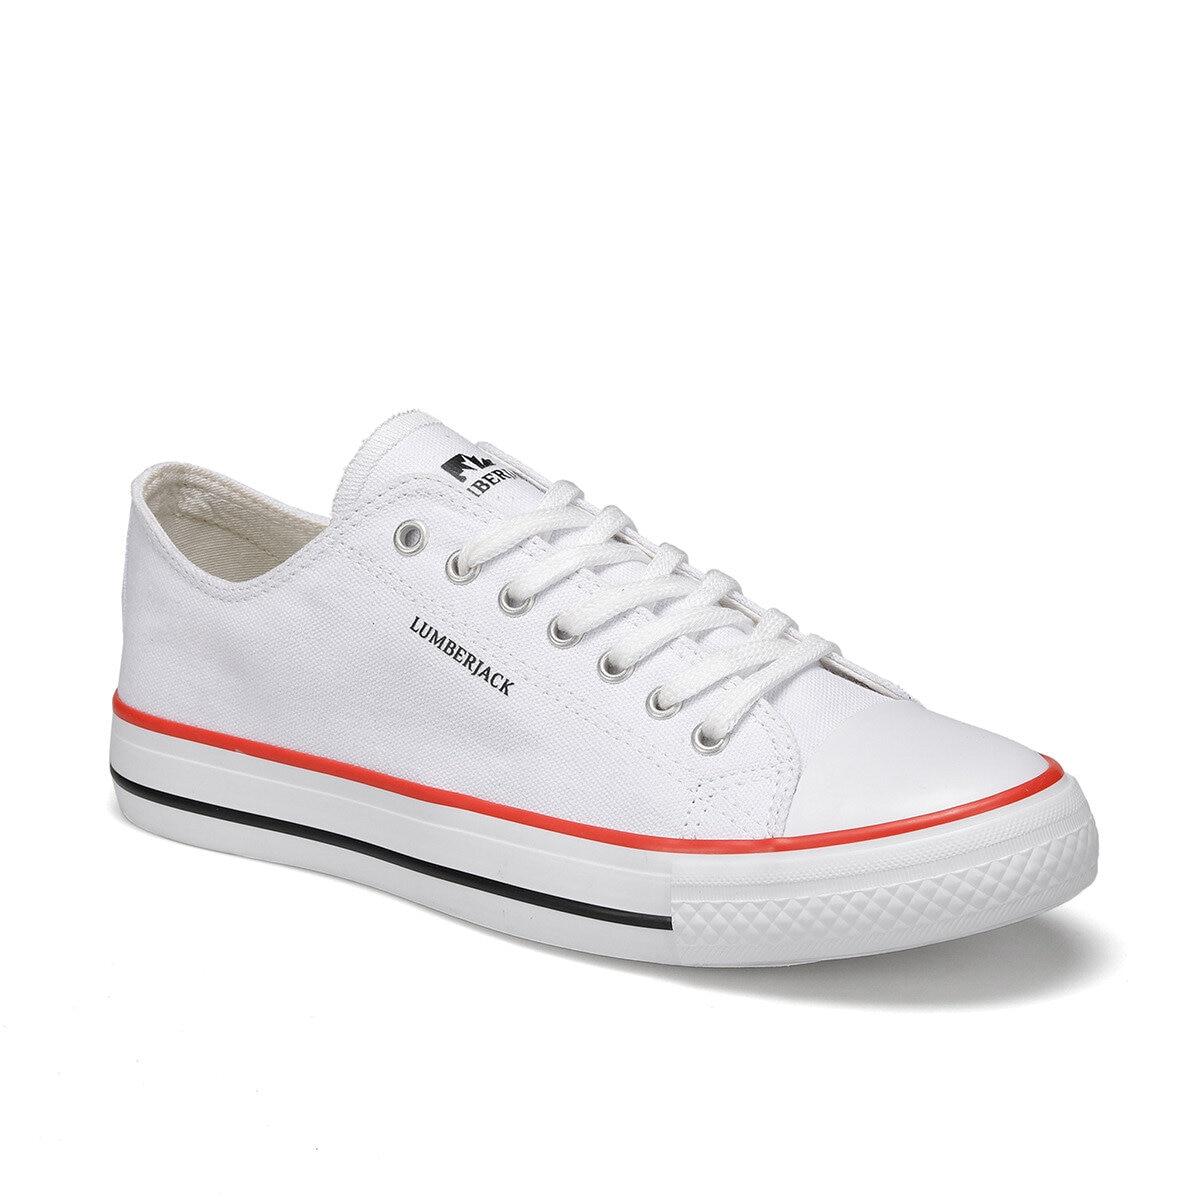 FLO MAXWELL White Male Sneaker LUMBERJACK